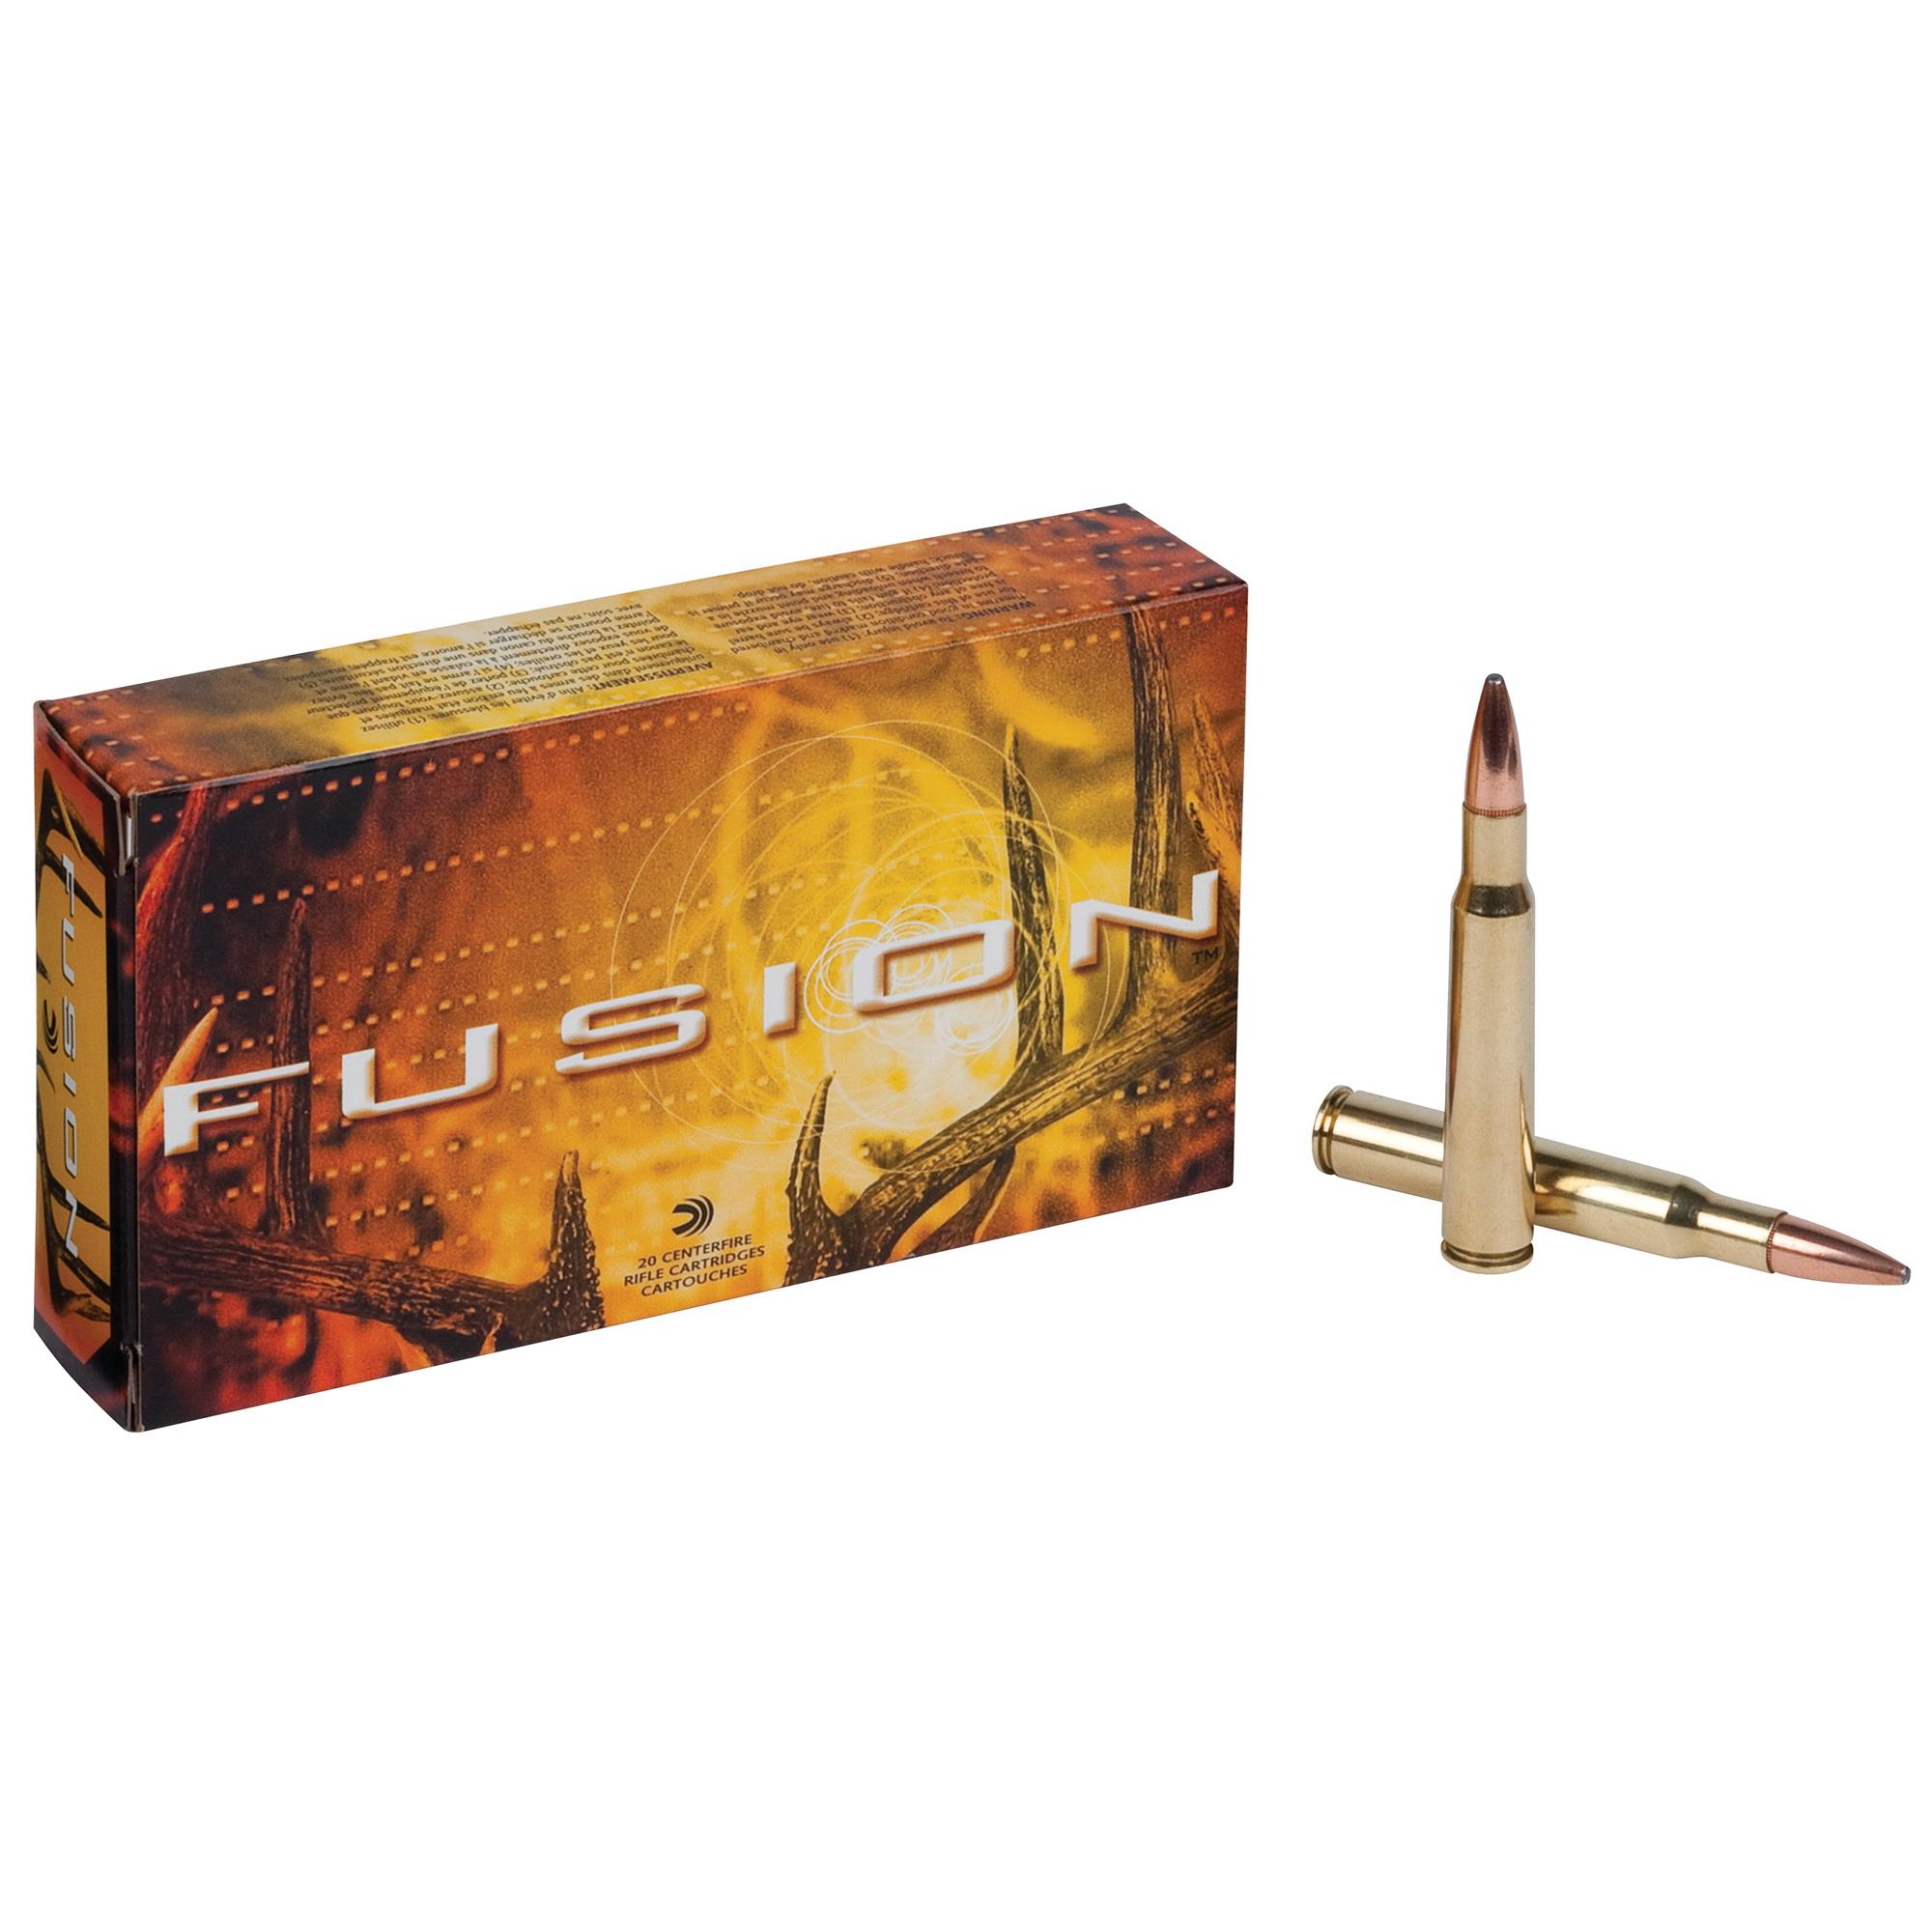 Fusion Rifle Ammunition, .30-06 Spring, 165-gr, BTSP